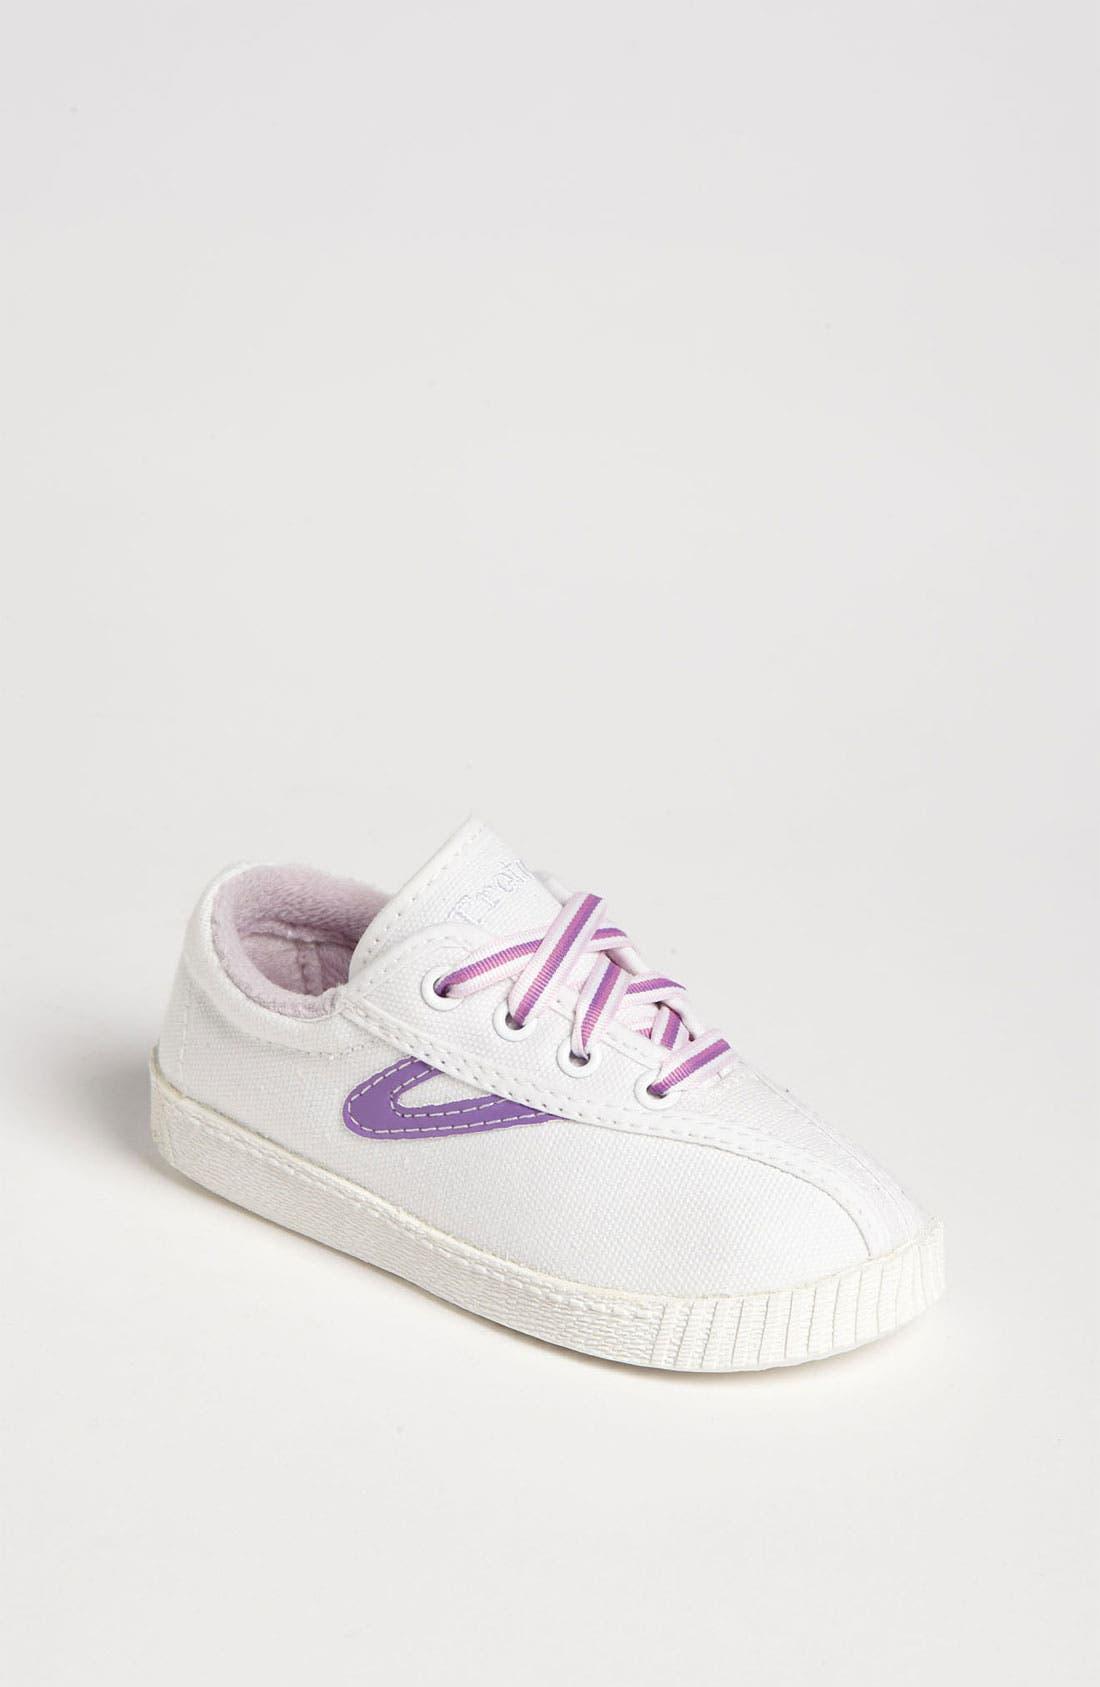 Alternate Image 1 Selected - Tretorn 'Nylite' Tennis Shoe (Baby, Walker & Toddler)